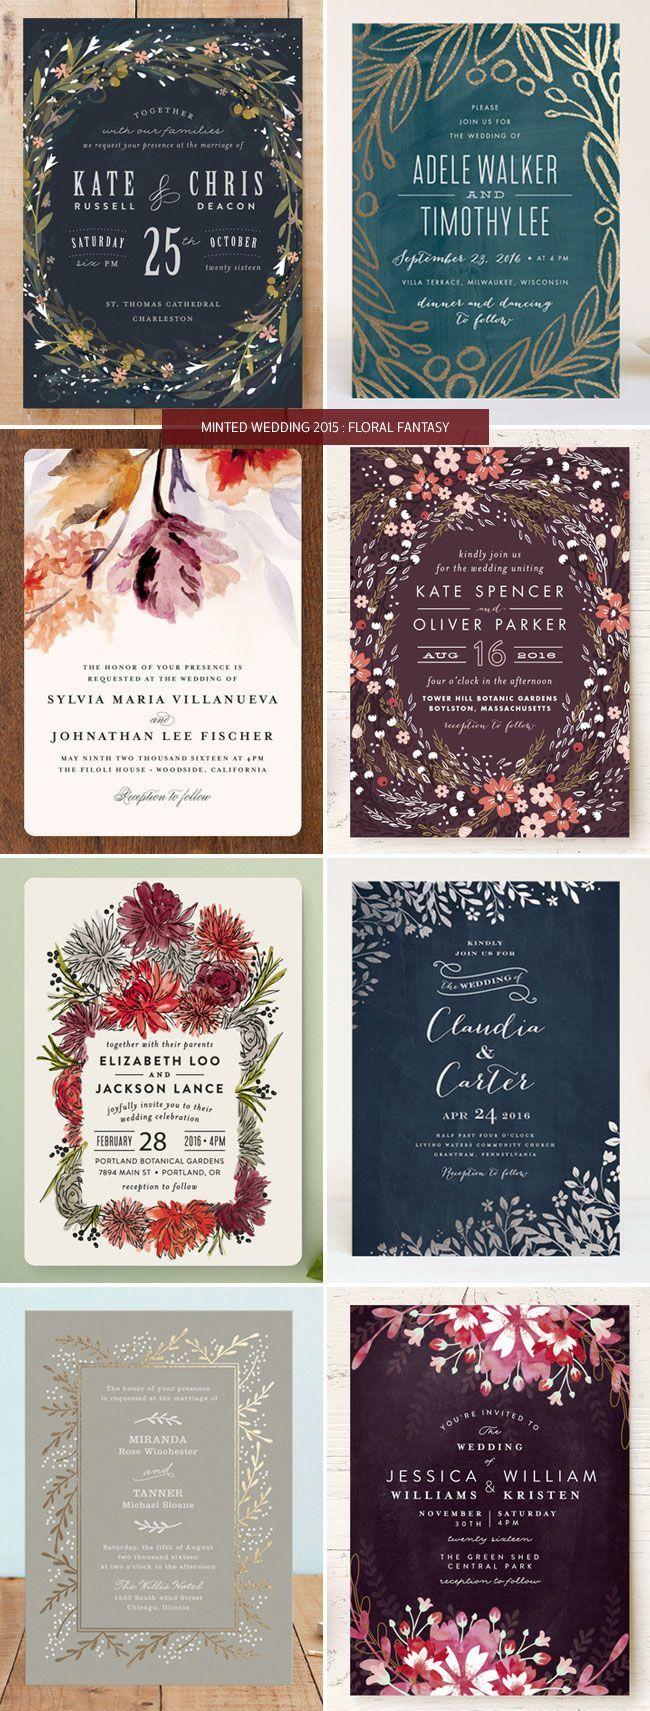 Minted Wedding Invitations 2015 Floral Fantasy Wedding